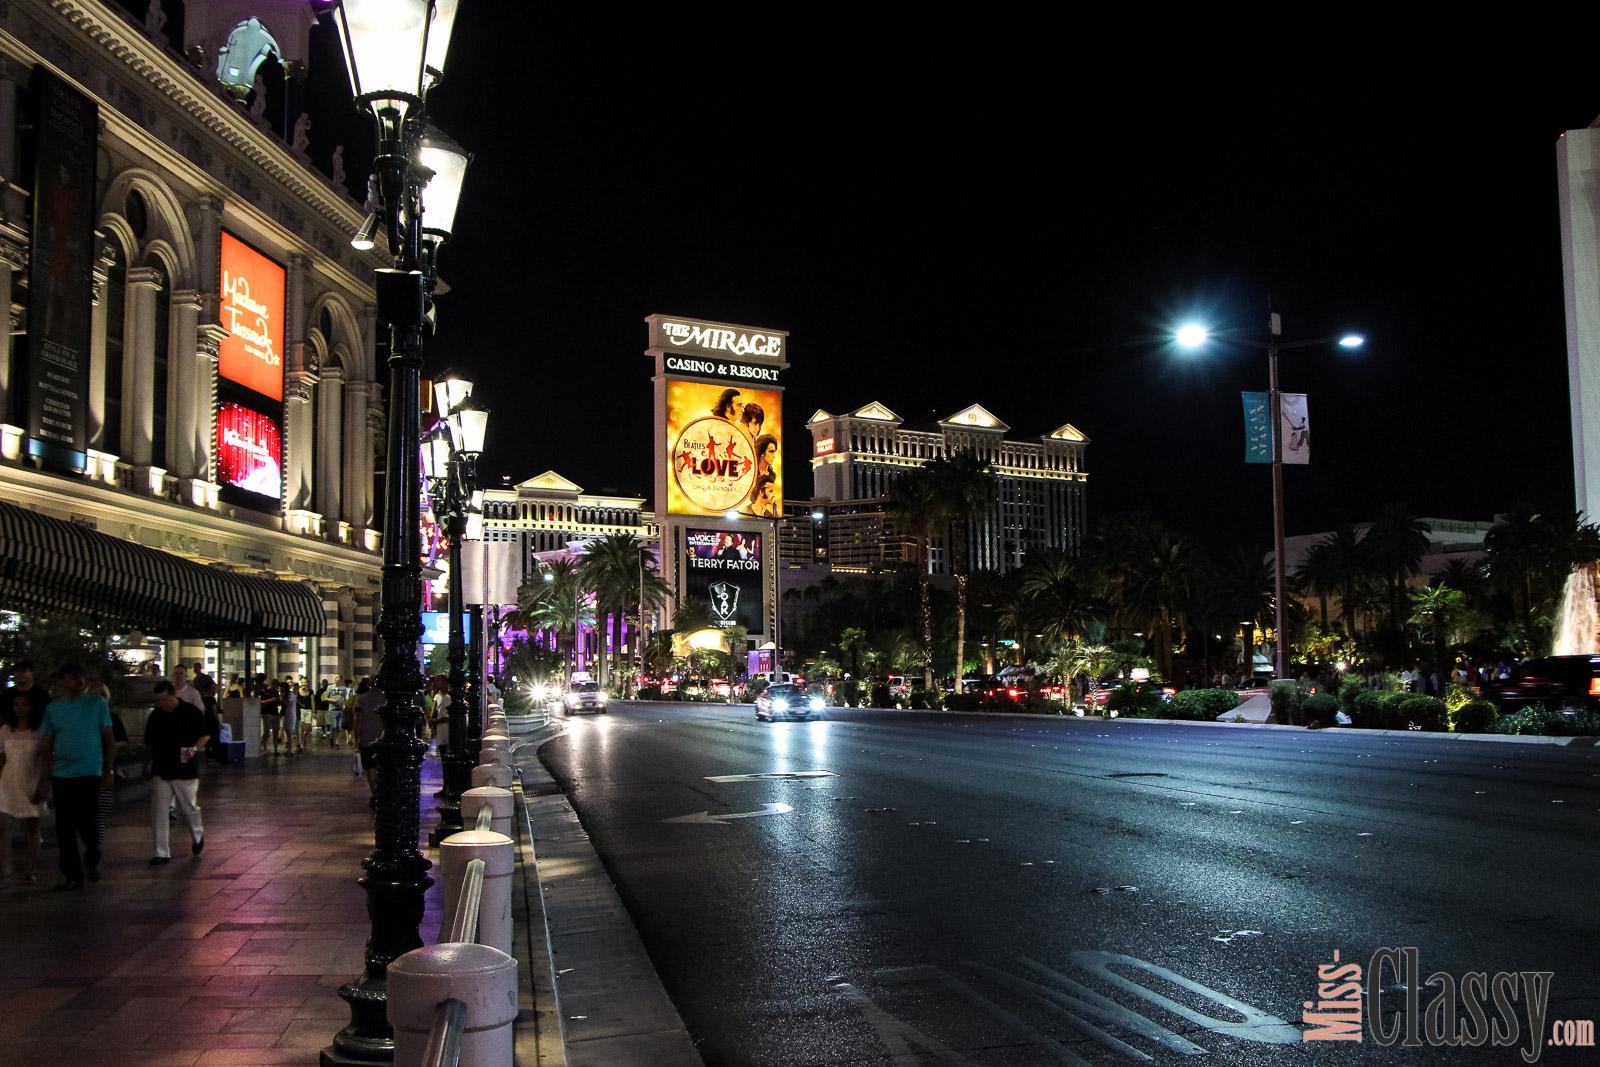 TRAVEL Viva Las Vegas, Miss Classy, miss-classy.com, Lifestyleblog, Lifestyleblogger, Lifestyleblog Graz, Travelblog, Travelblogger, Graz, Steiermark, Österreich, classy, beclassy, Reise, Travel, Wanderlust, Wayfarer, USA, Westküste, Roadtrip, Las Vegas, Nevada, The Strip, The LINQ, Hard Rock Hotel, Casino, Welcome to fabulous Las Vegas